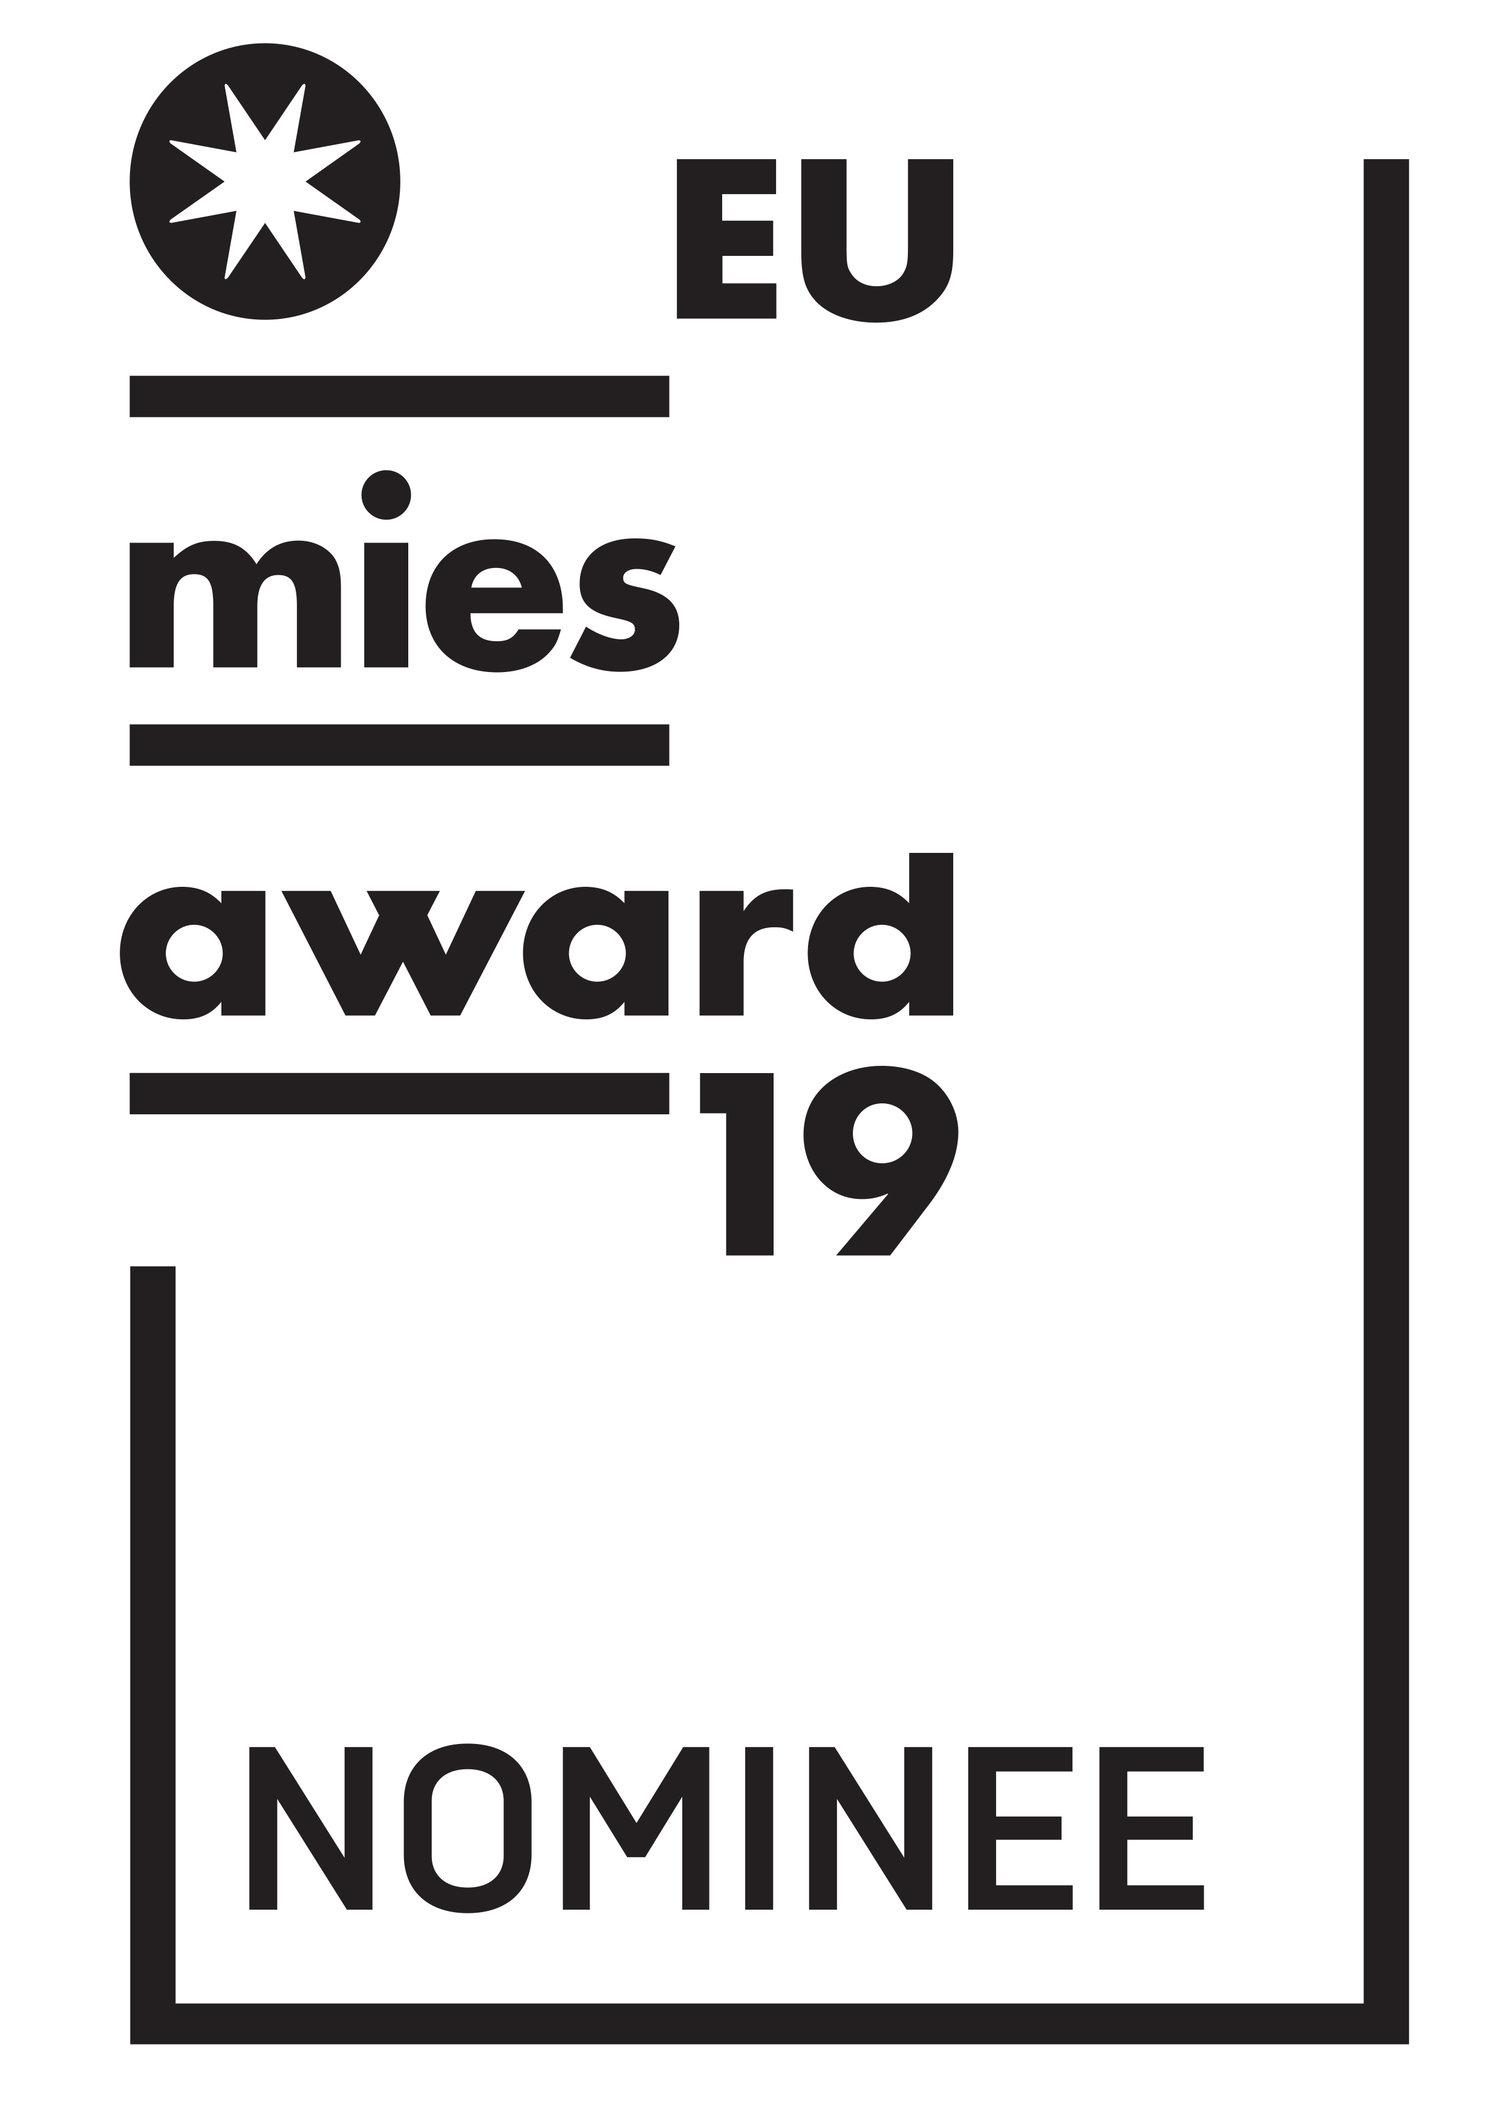 eumiesaward-nominee-2019-black